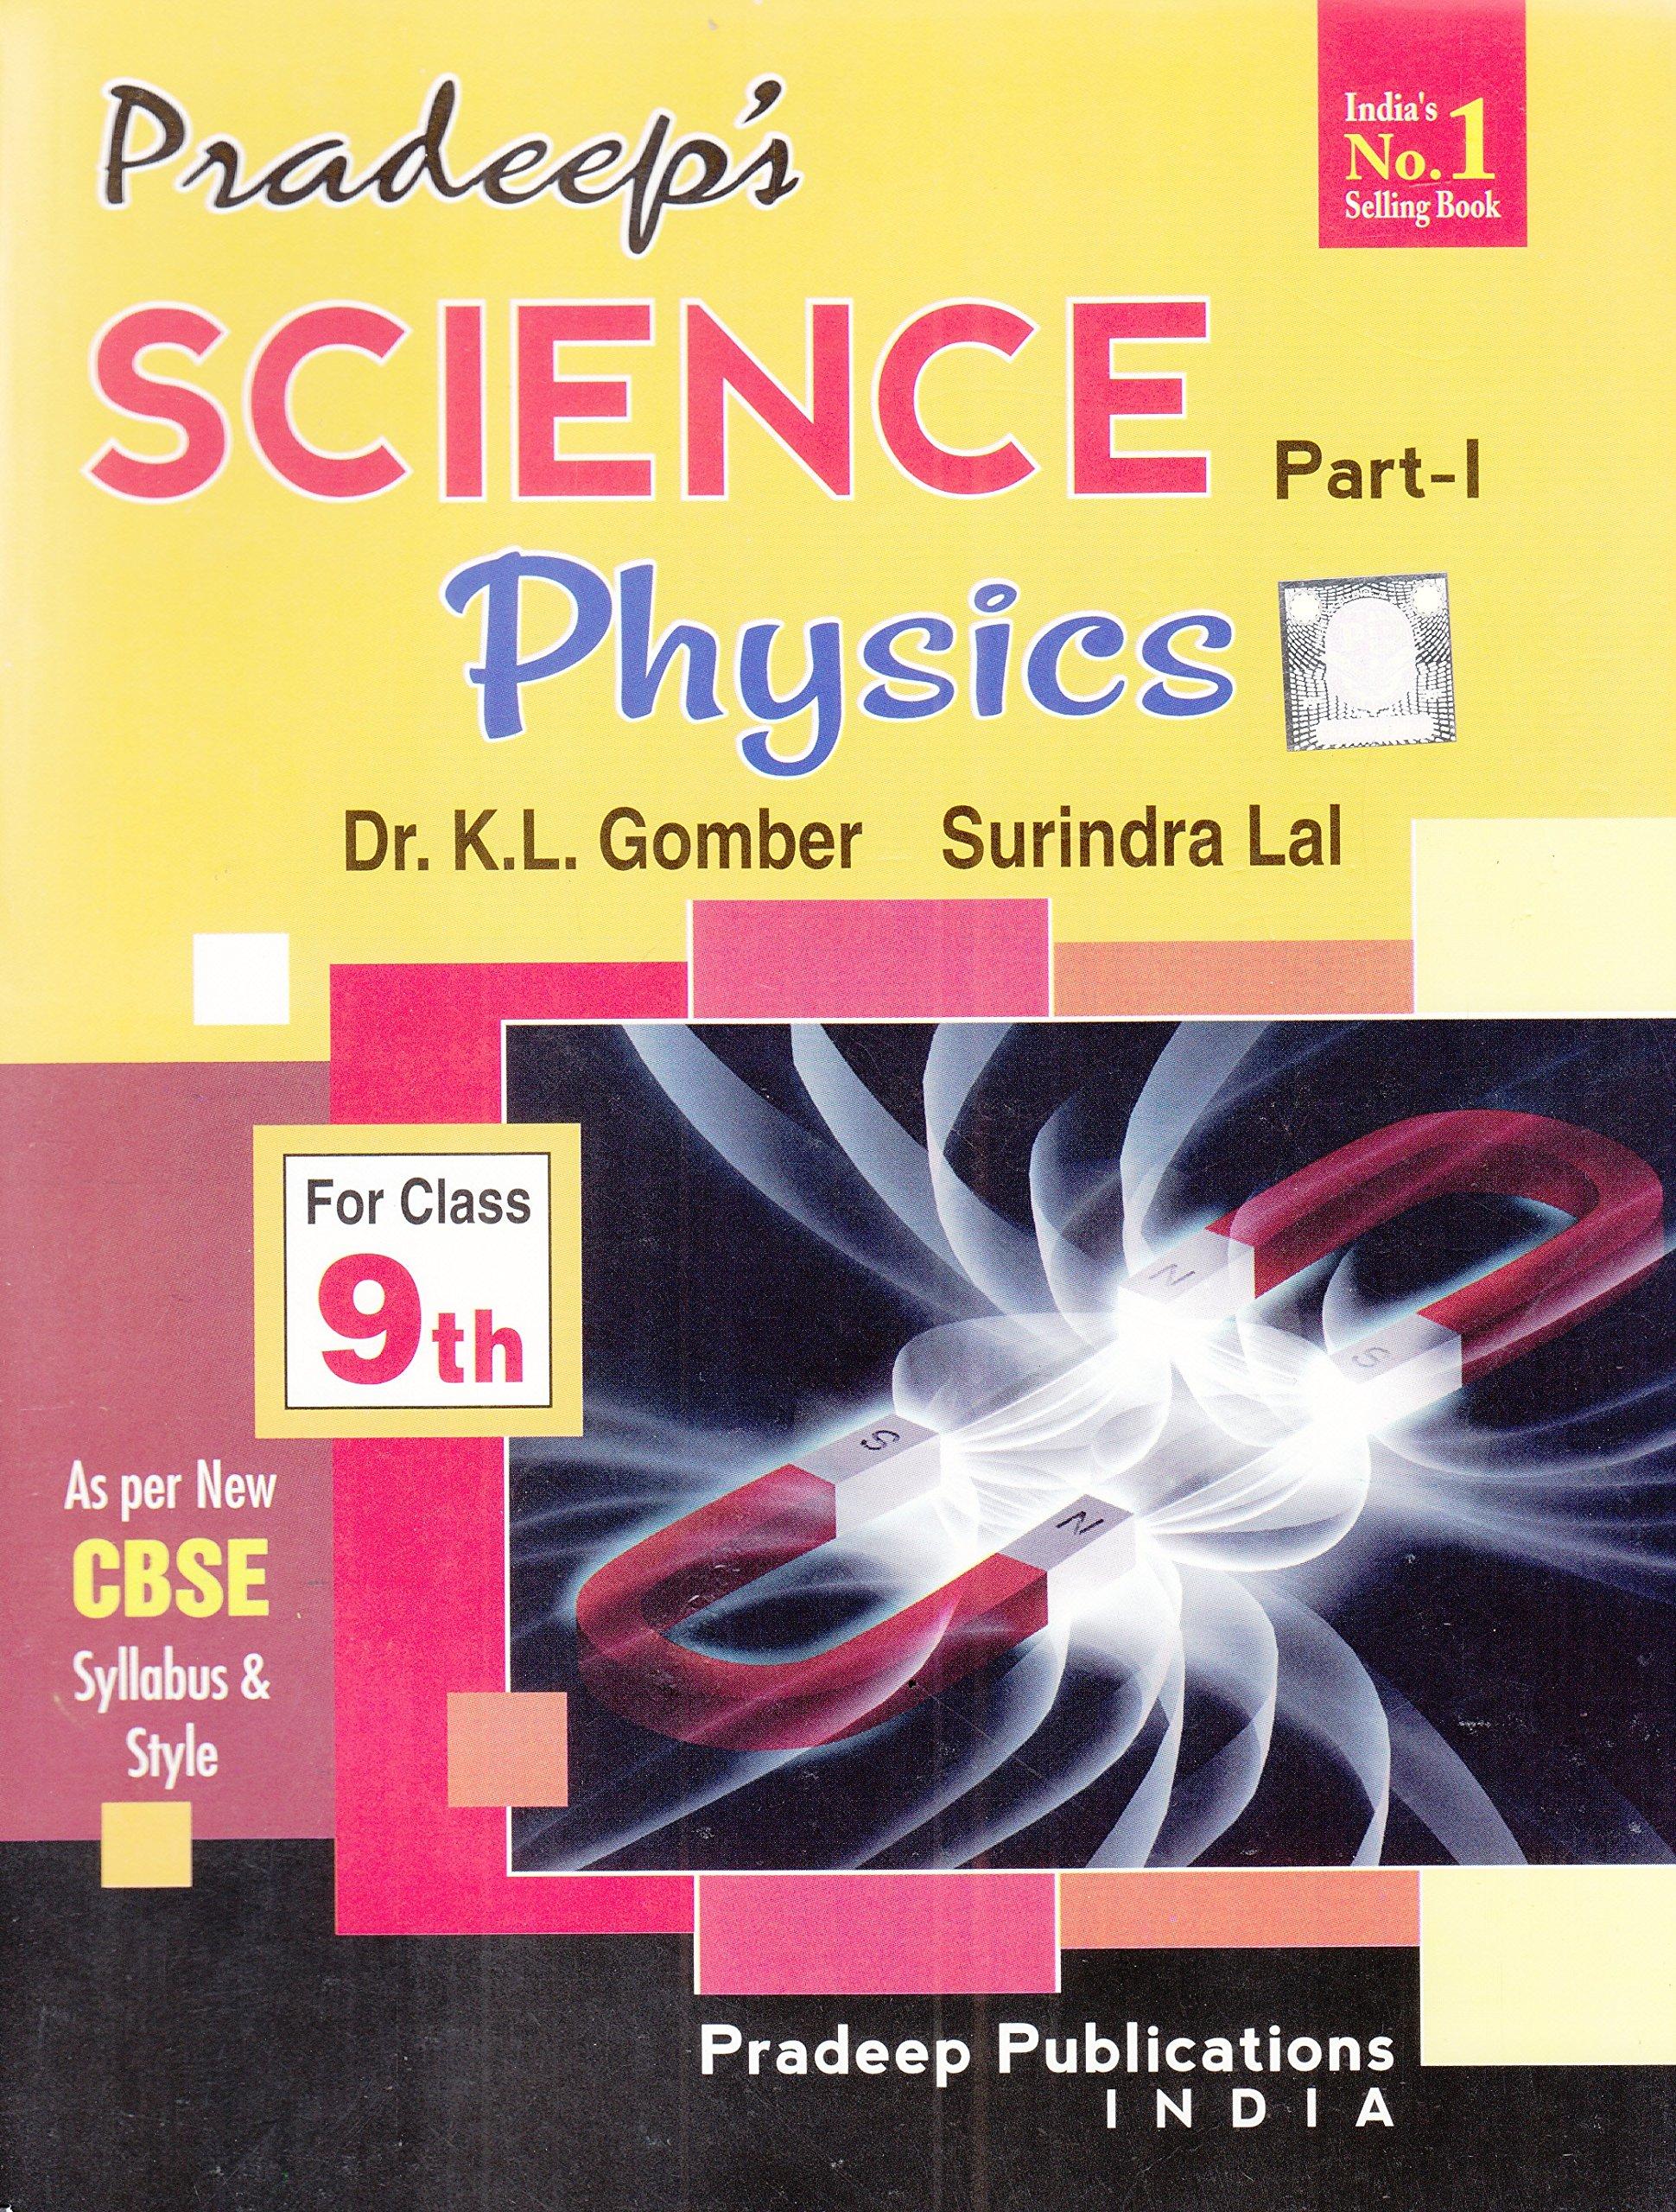 Pradeep Physics Book